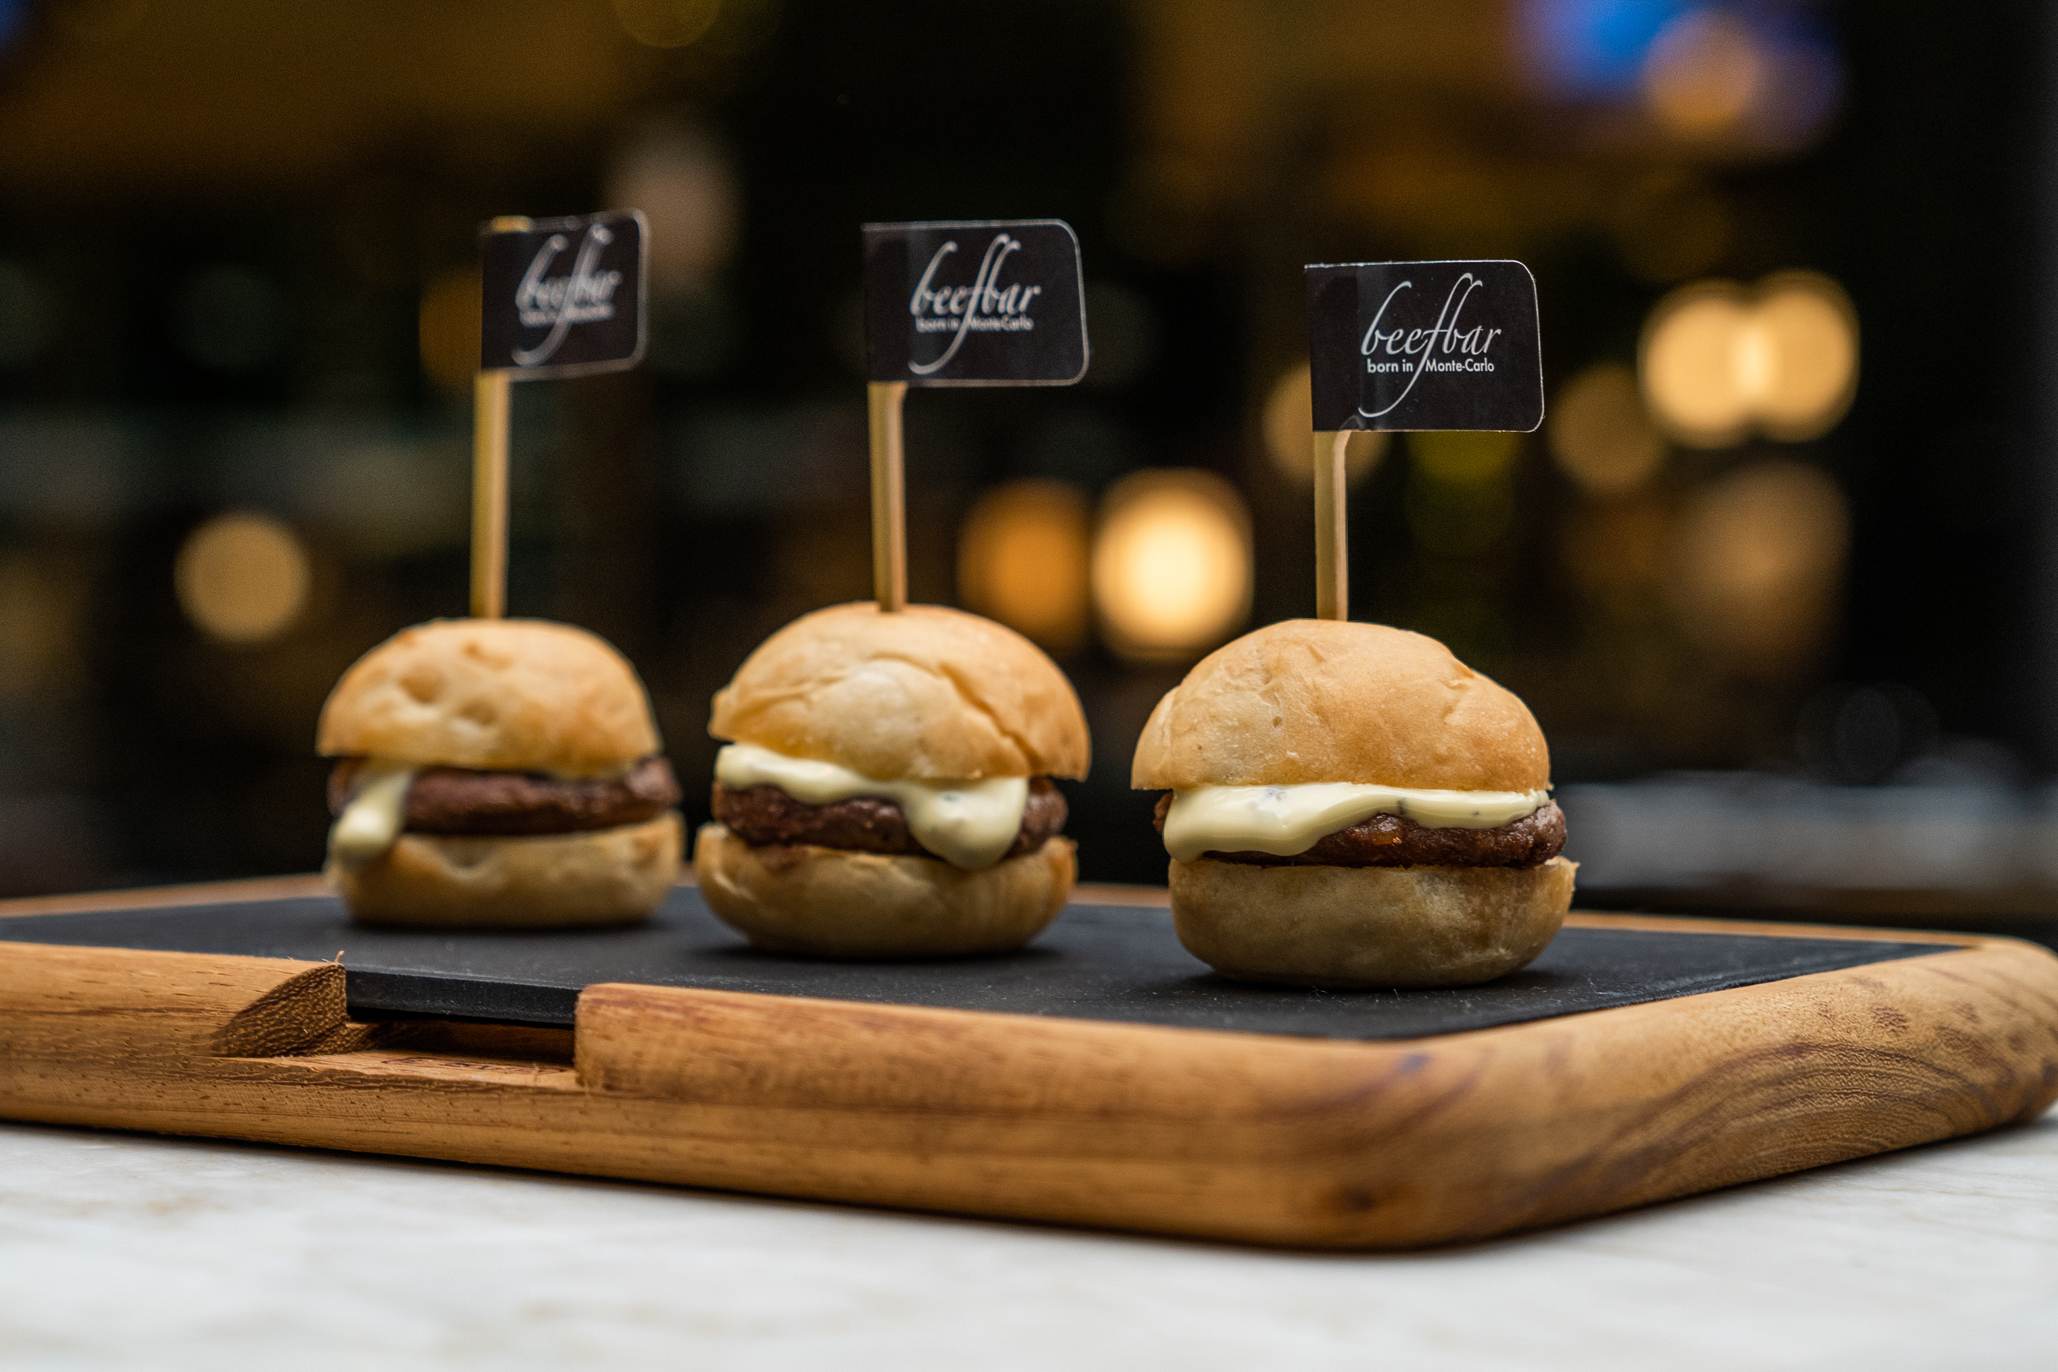 Beefbar mini burgers